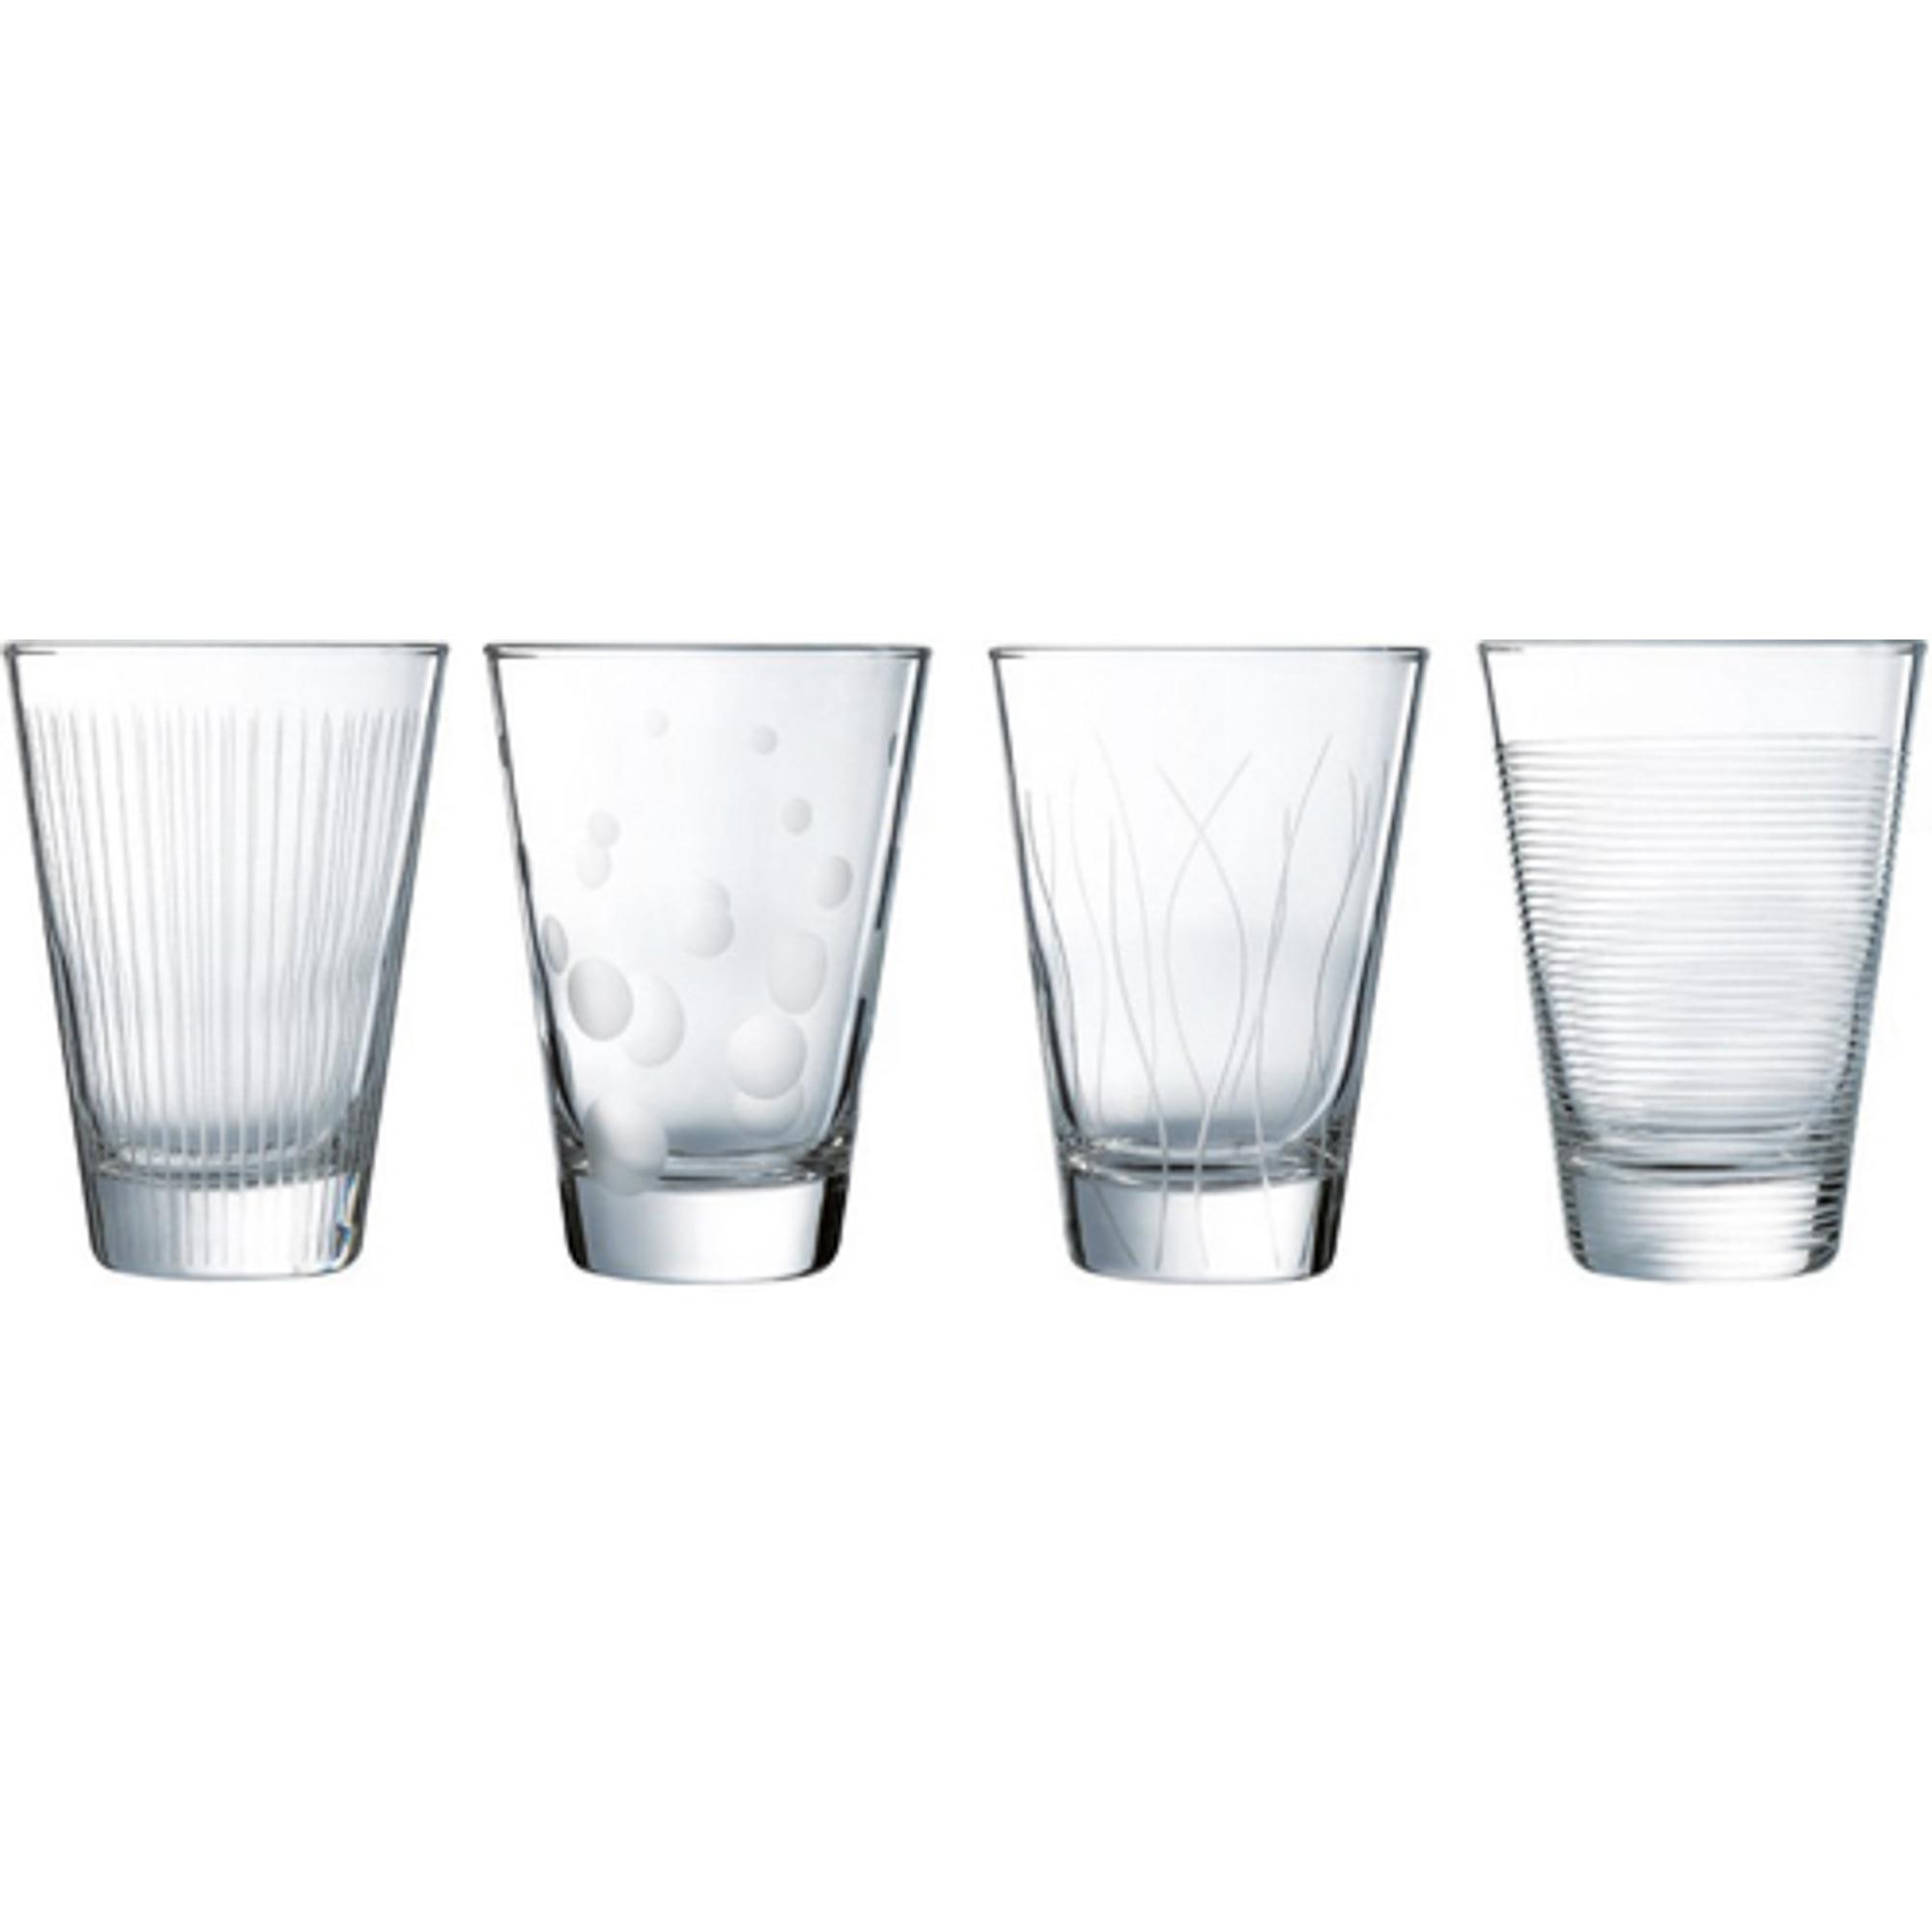 Набор стаканов лаунж клаб 300мл 4шт Luminarc набор стаканов luminarc иллюминейшн колорс 380мл 4шт l7604